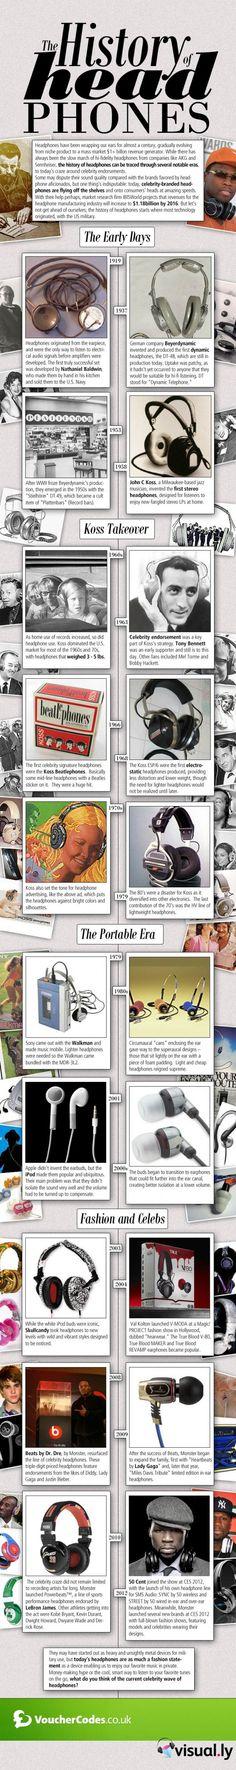 The History Of Headphones. #headphones #music #cans http://www.pinterest.com/TheHitman14/headphones-microphones-%2B/